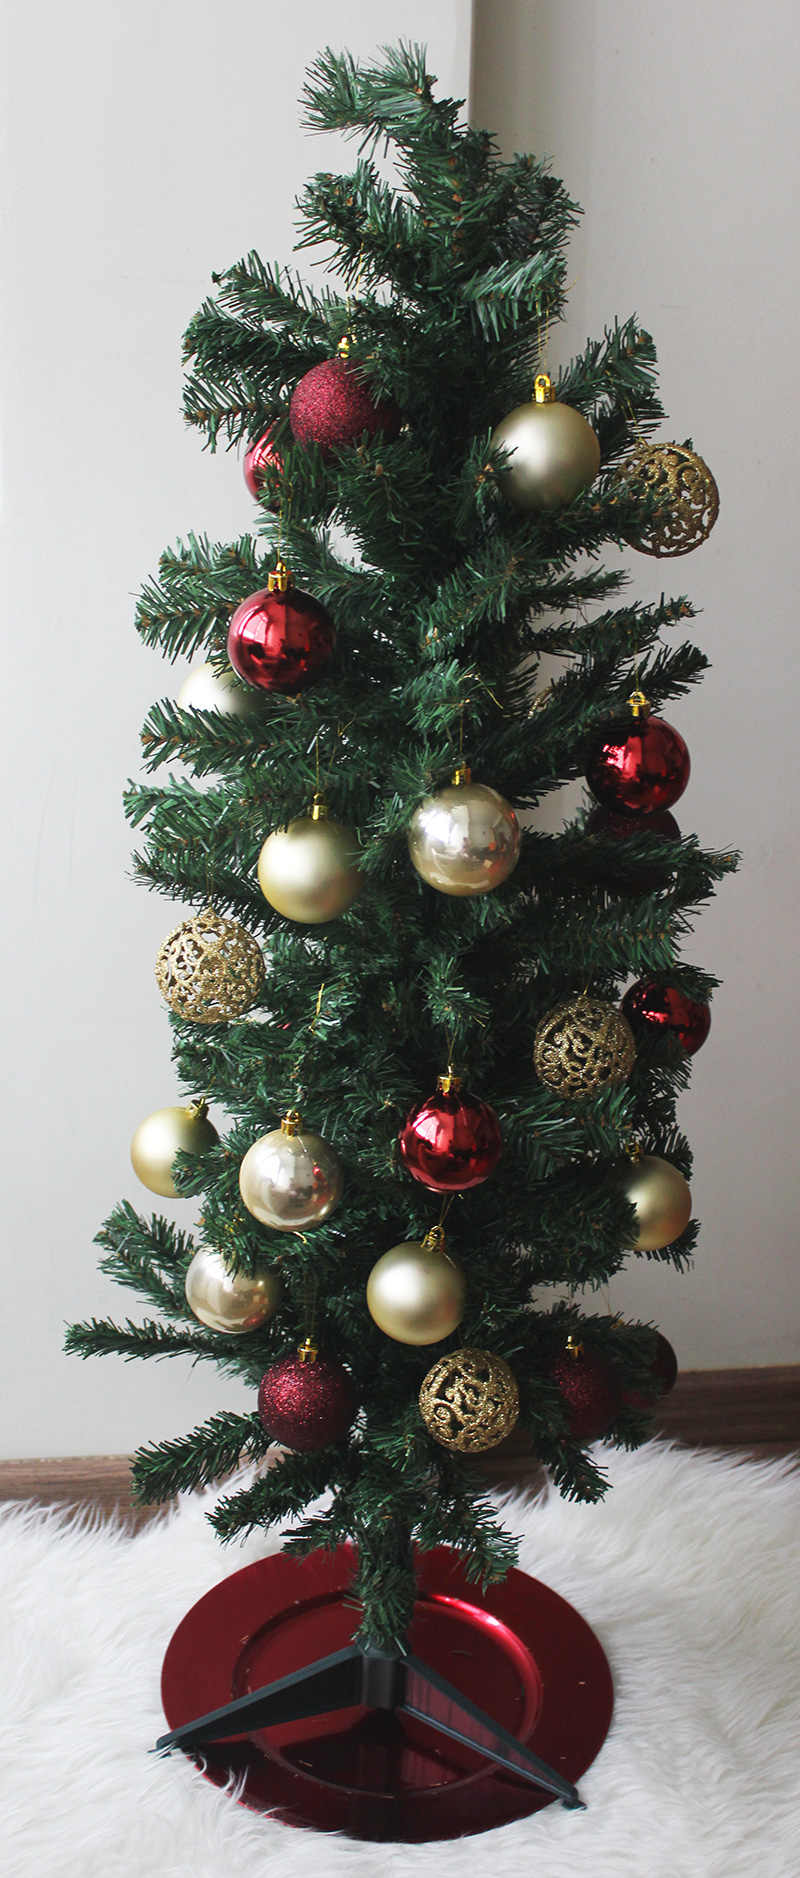 My Christmas Three